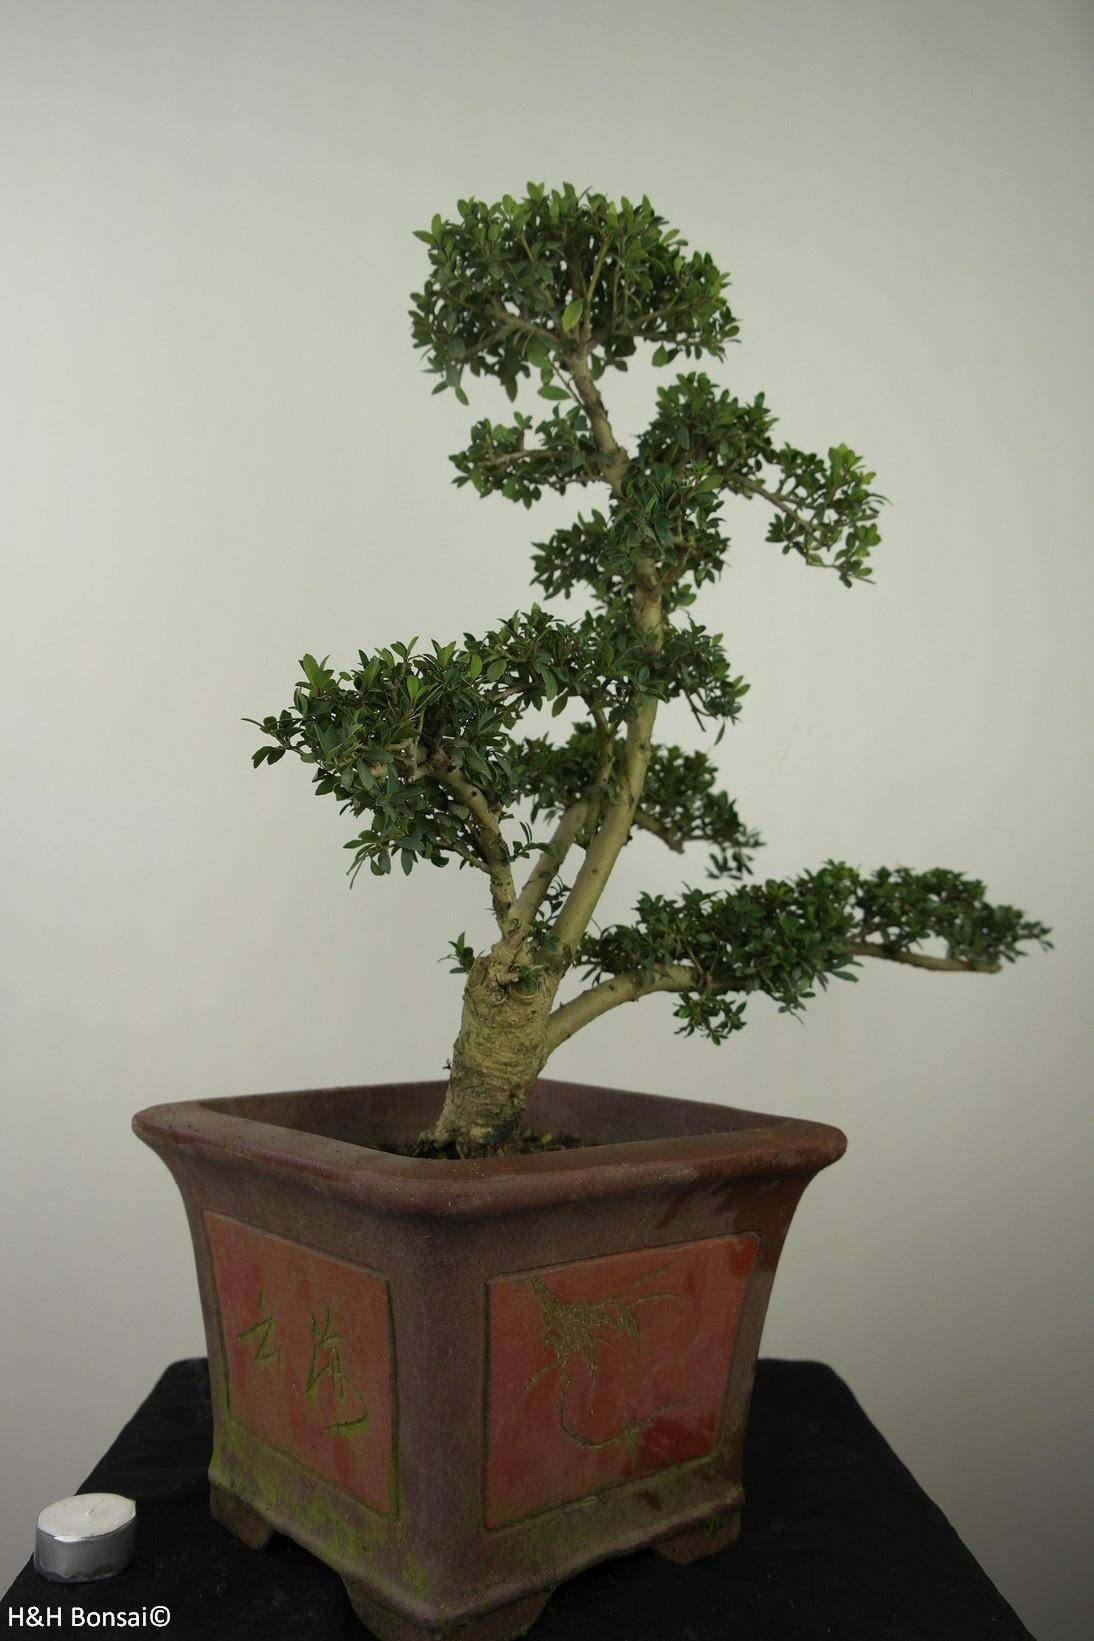 Bonsai Japanese Holly, Ilex crenata, no. 7747